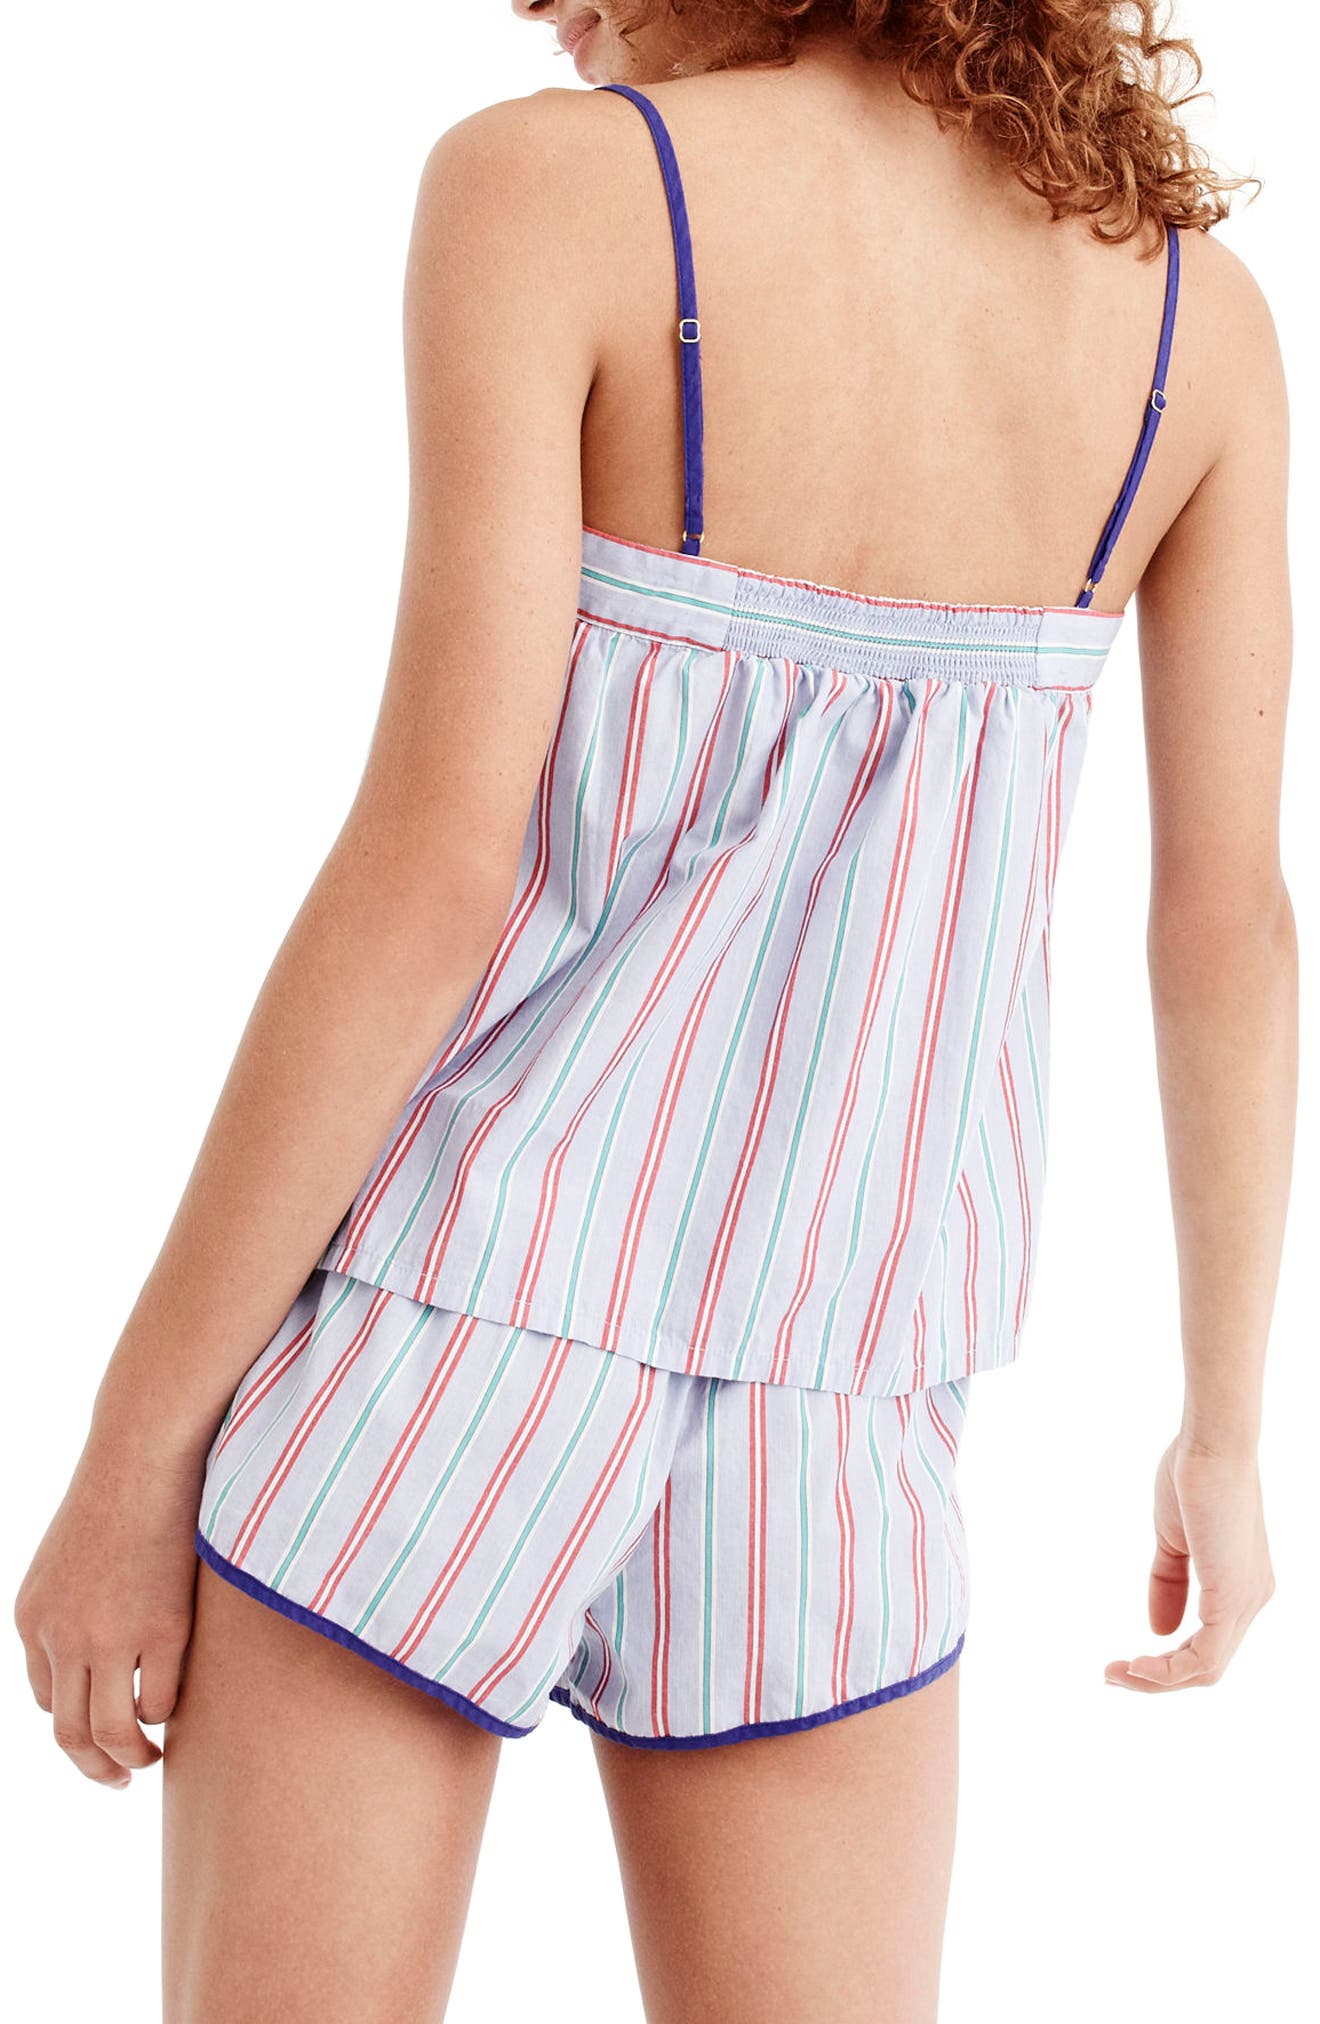 J.Crew Candy Stripe Short Pajamas,                             Alternate thumbnail 2, color,                             Holiday Stripe